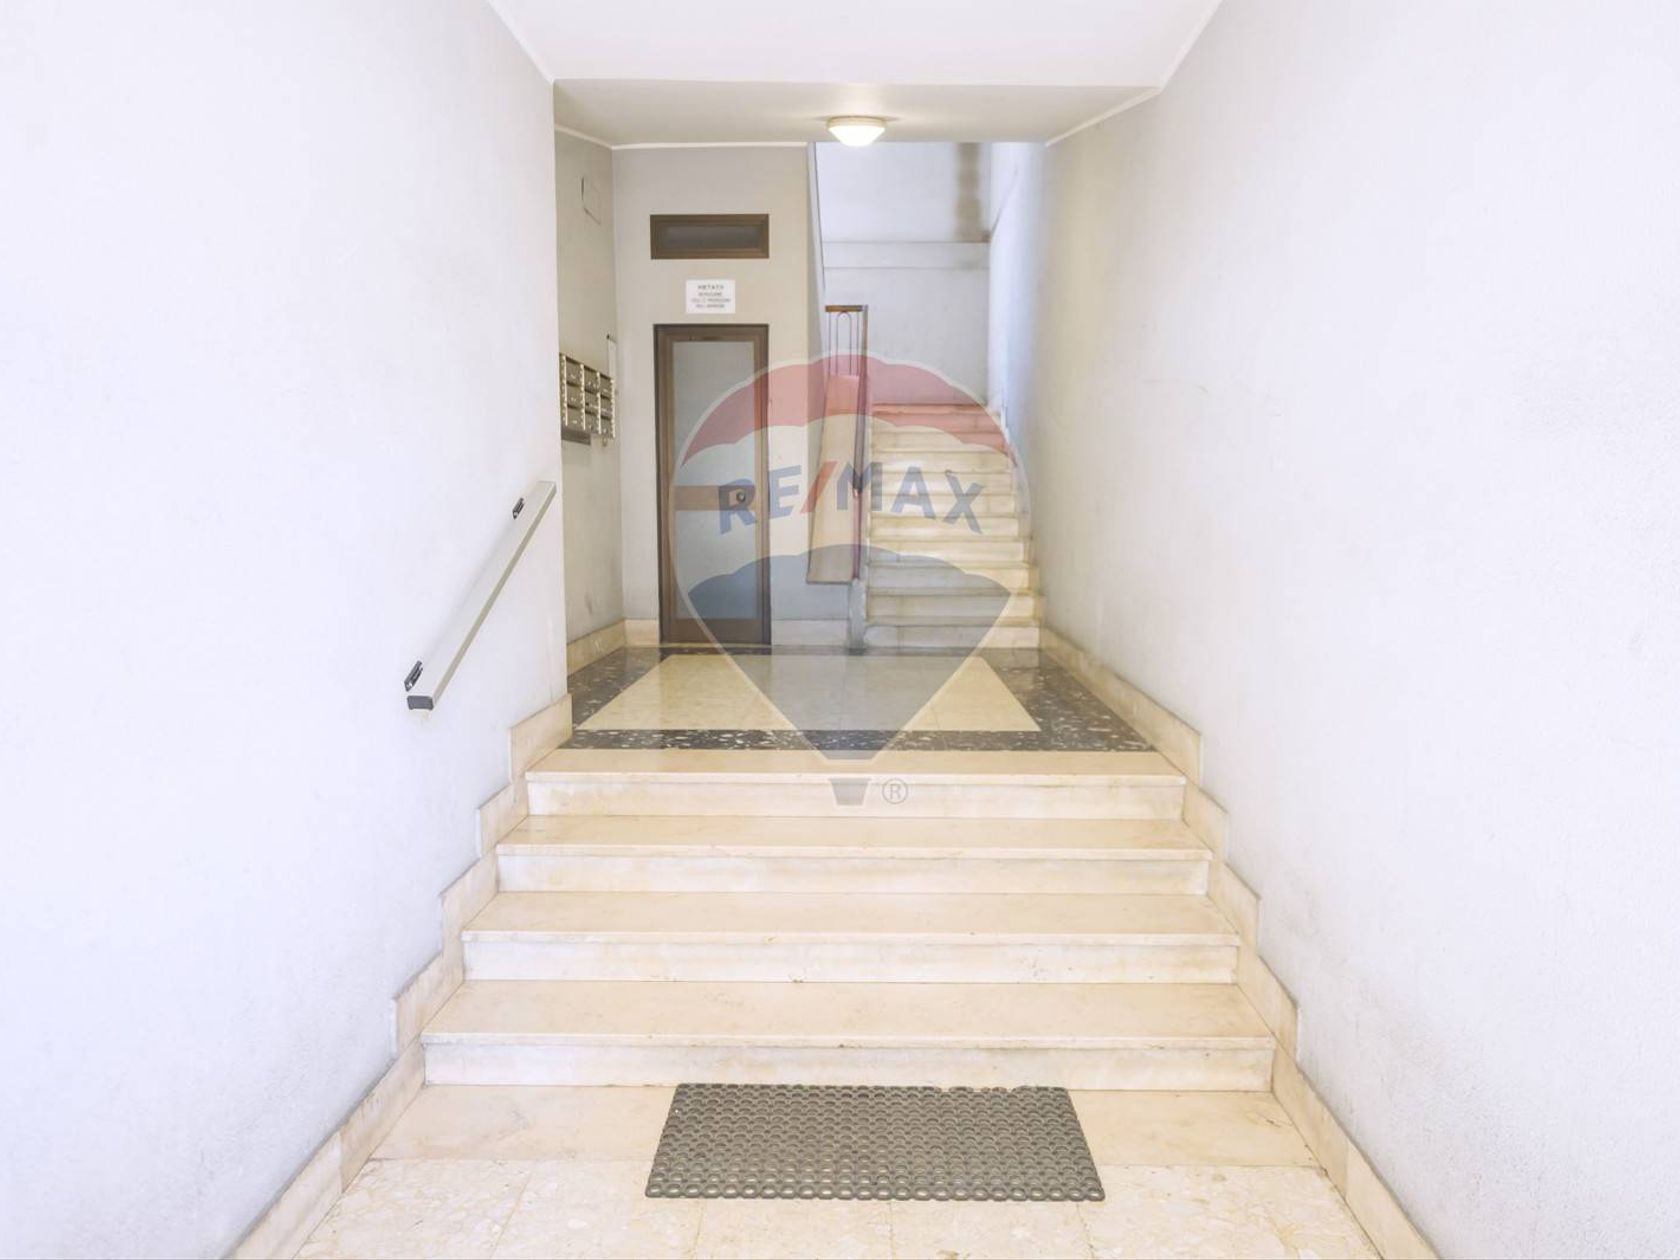 Appartamento Porta Nuova, Pescara, PE Vendita - Foto 2